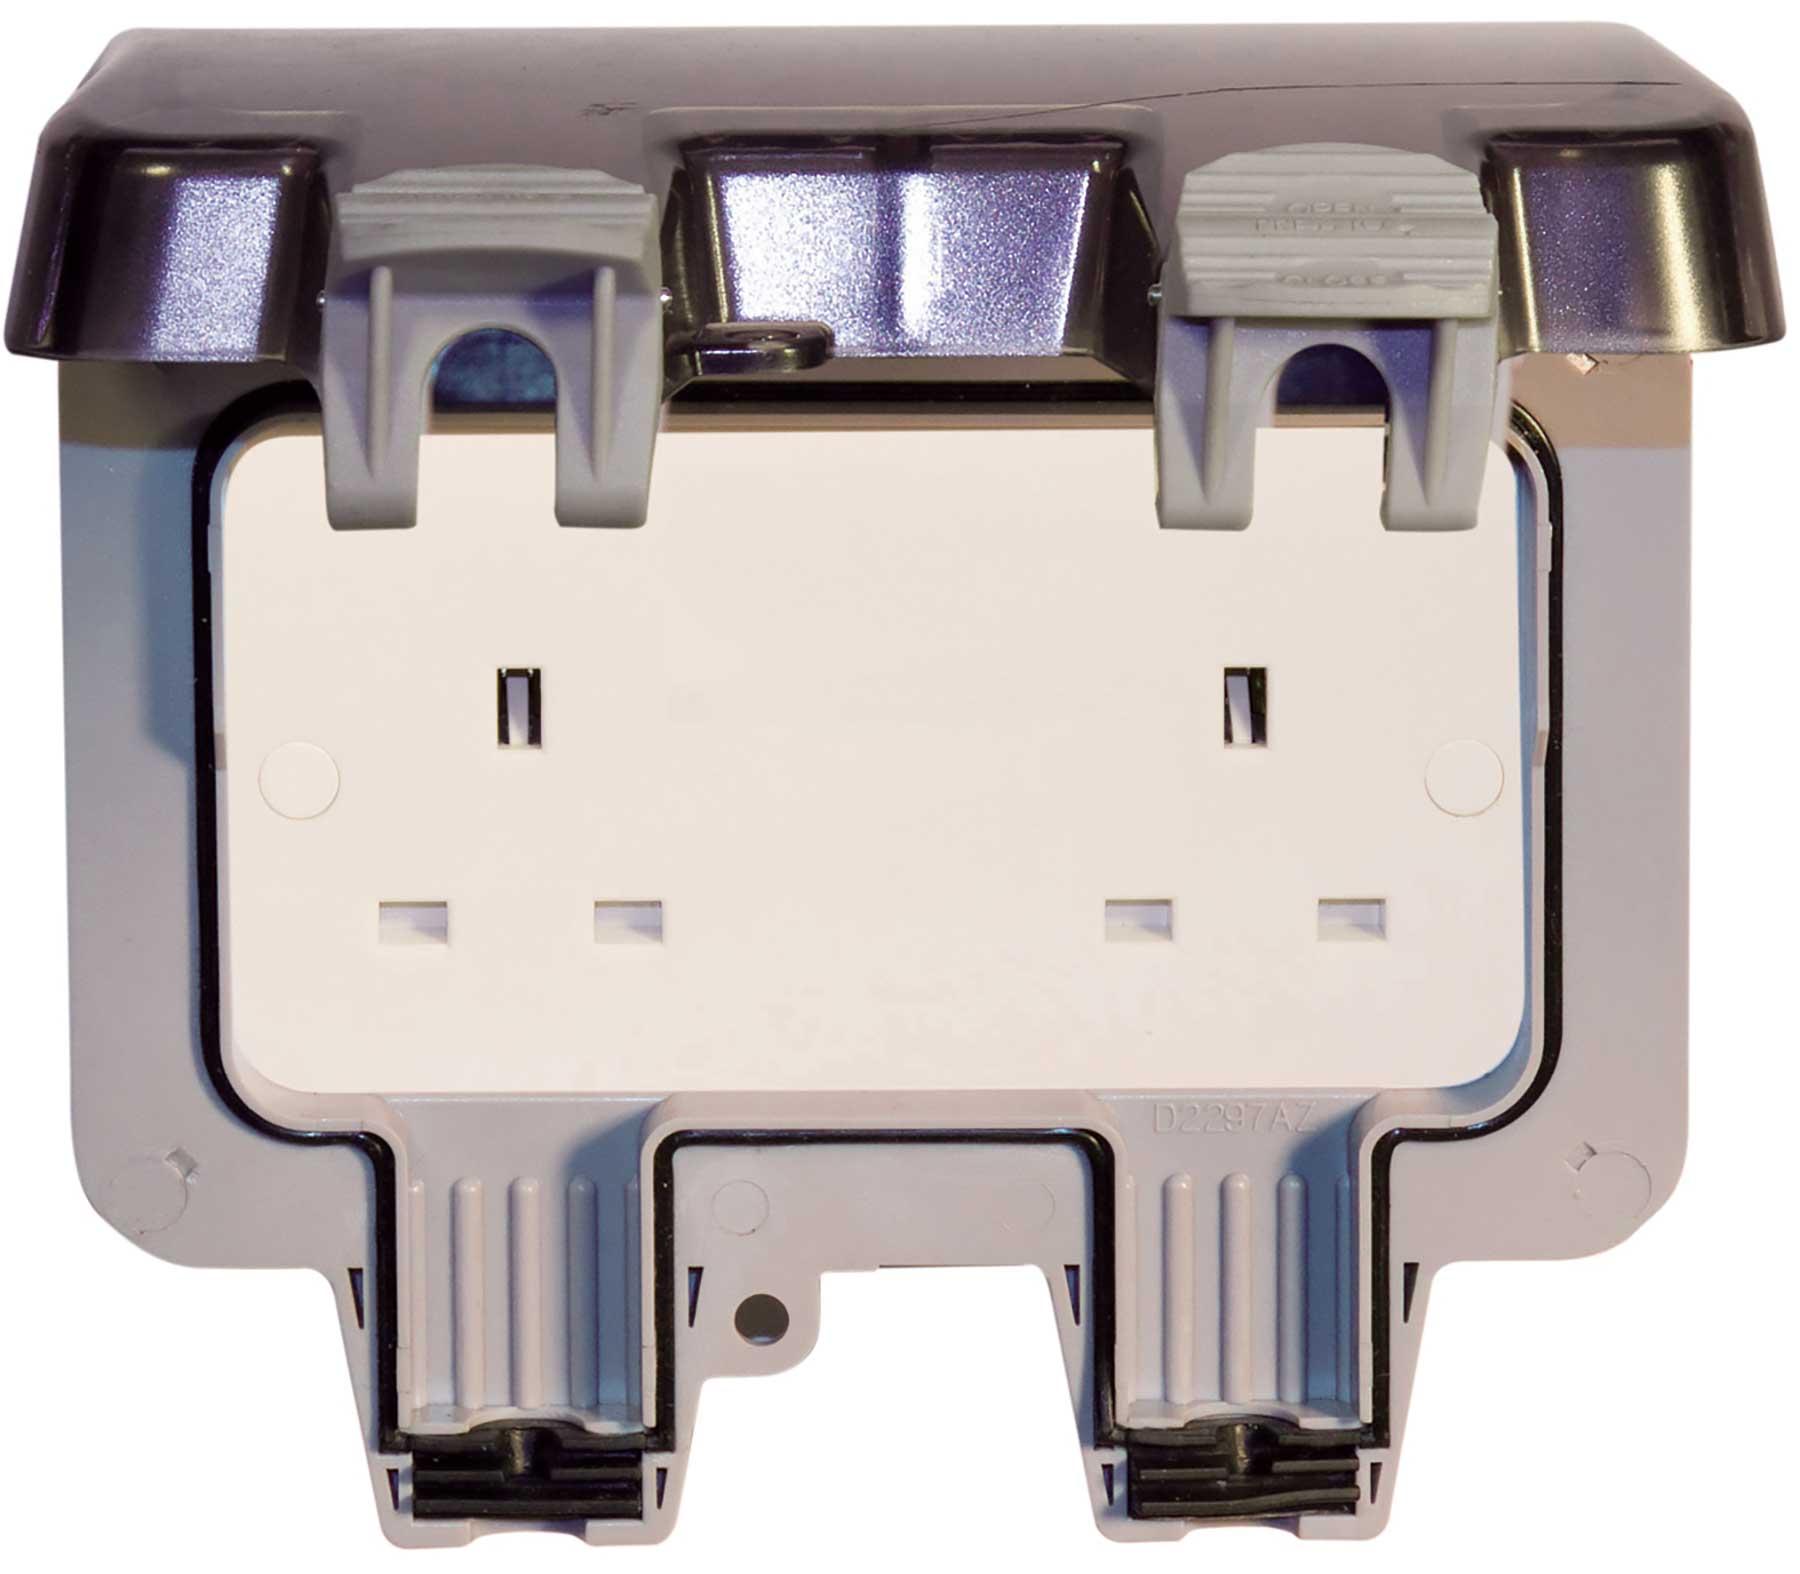 Bg Weatherproof Ip66 Outdoor Twin Power Socket 2 Gang Storm 13 Amp Wiring Accessories Thumbnail